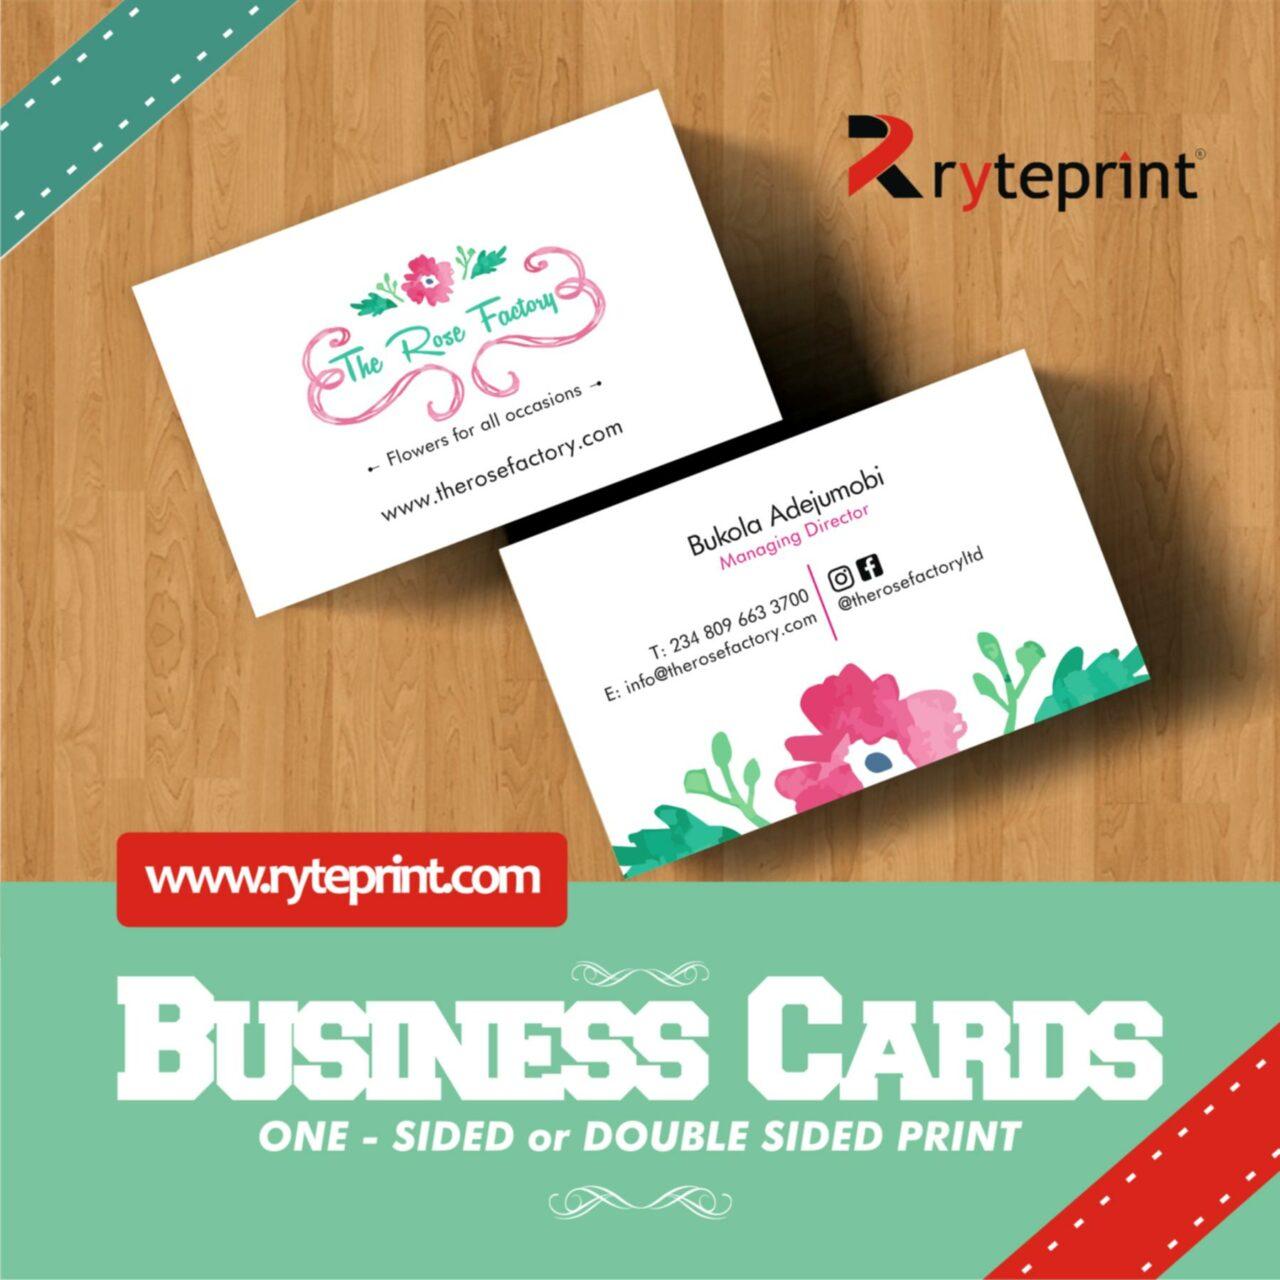 Ryteprint Business Cards Ad 1